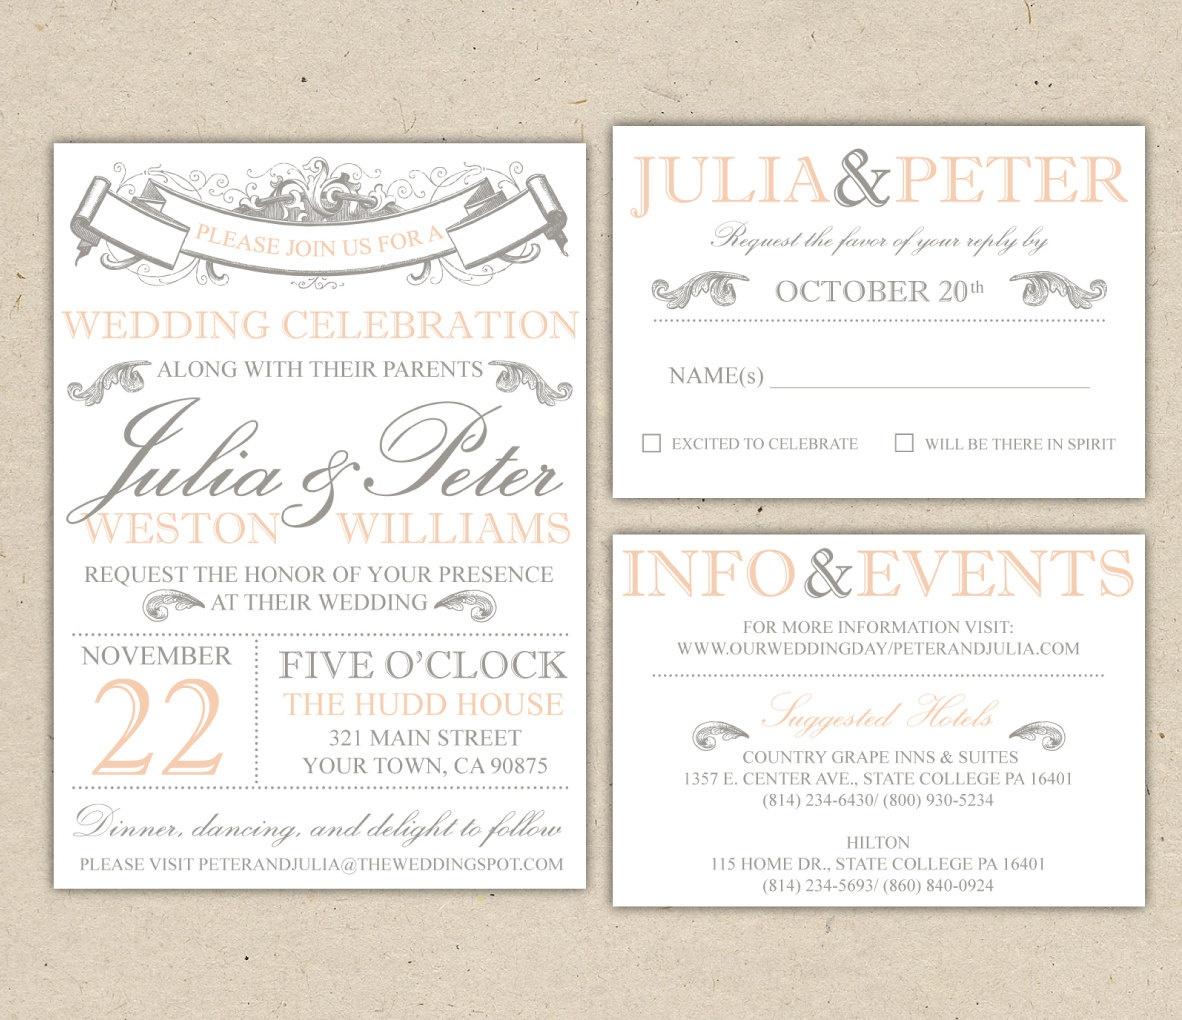 Free Printable Wedding Invitation Templates For Word Wedding - Free Printable Wedding Invitation Templates For Word